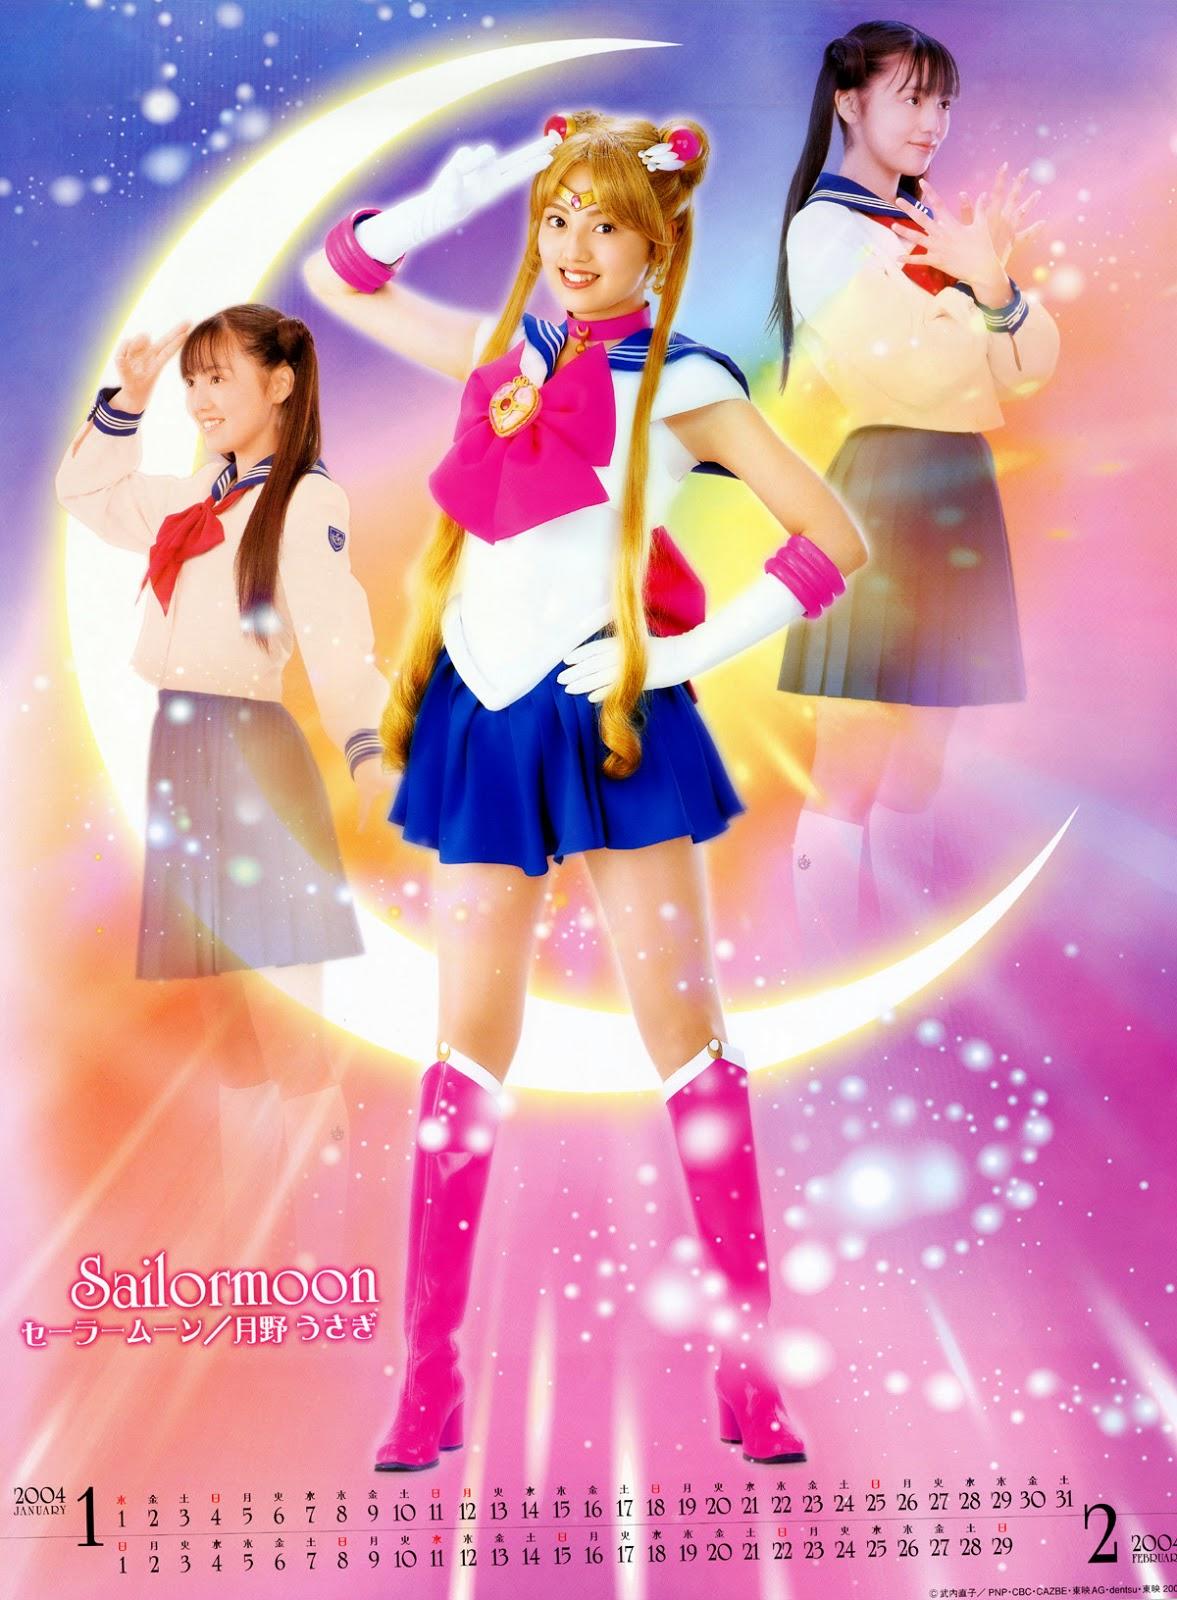 Sailor Moon Tv Usagi Serena Tuskino Sailor Moon